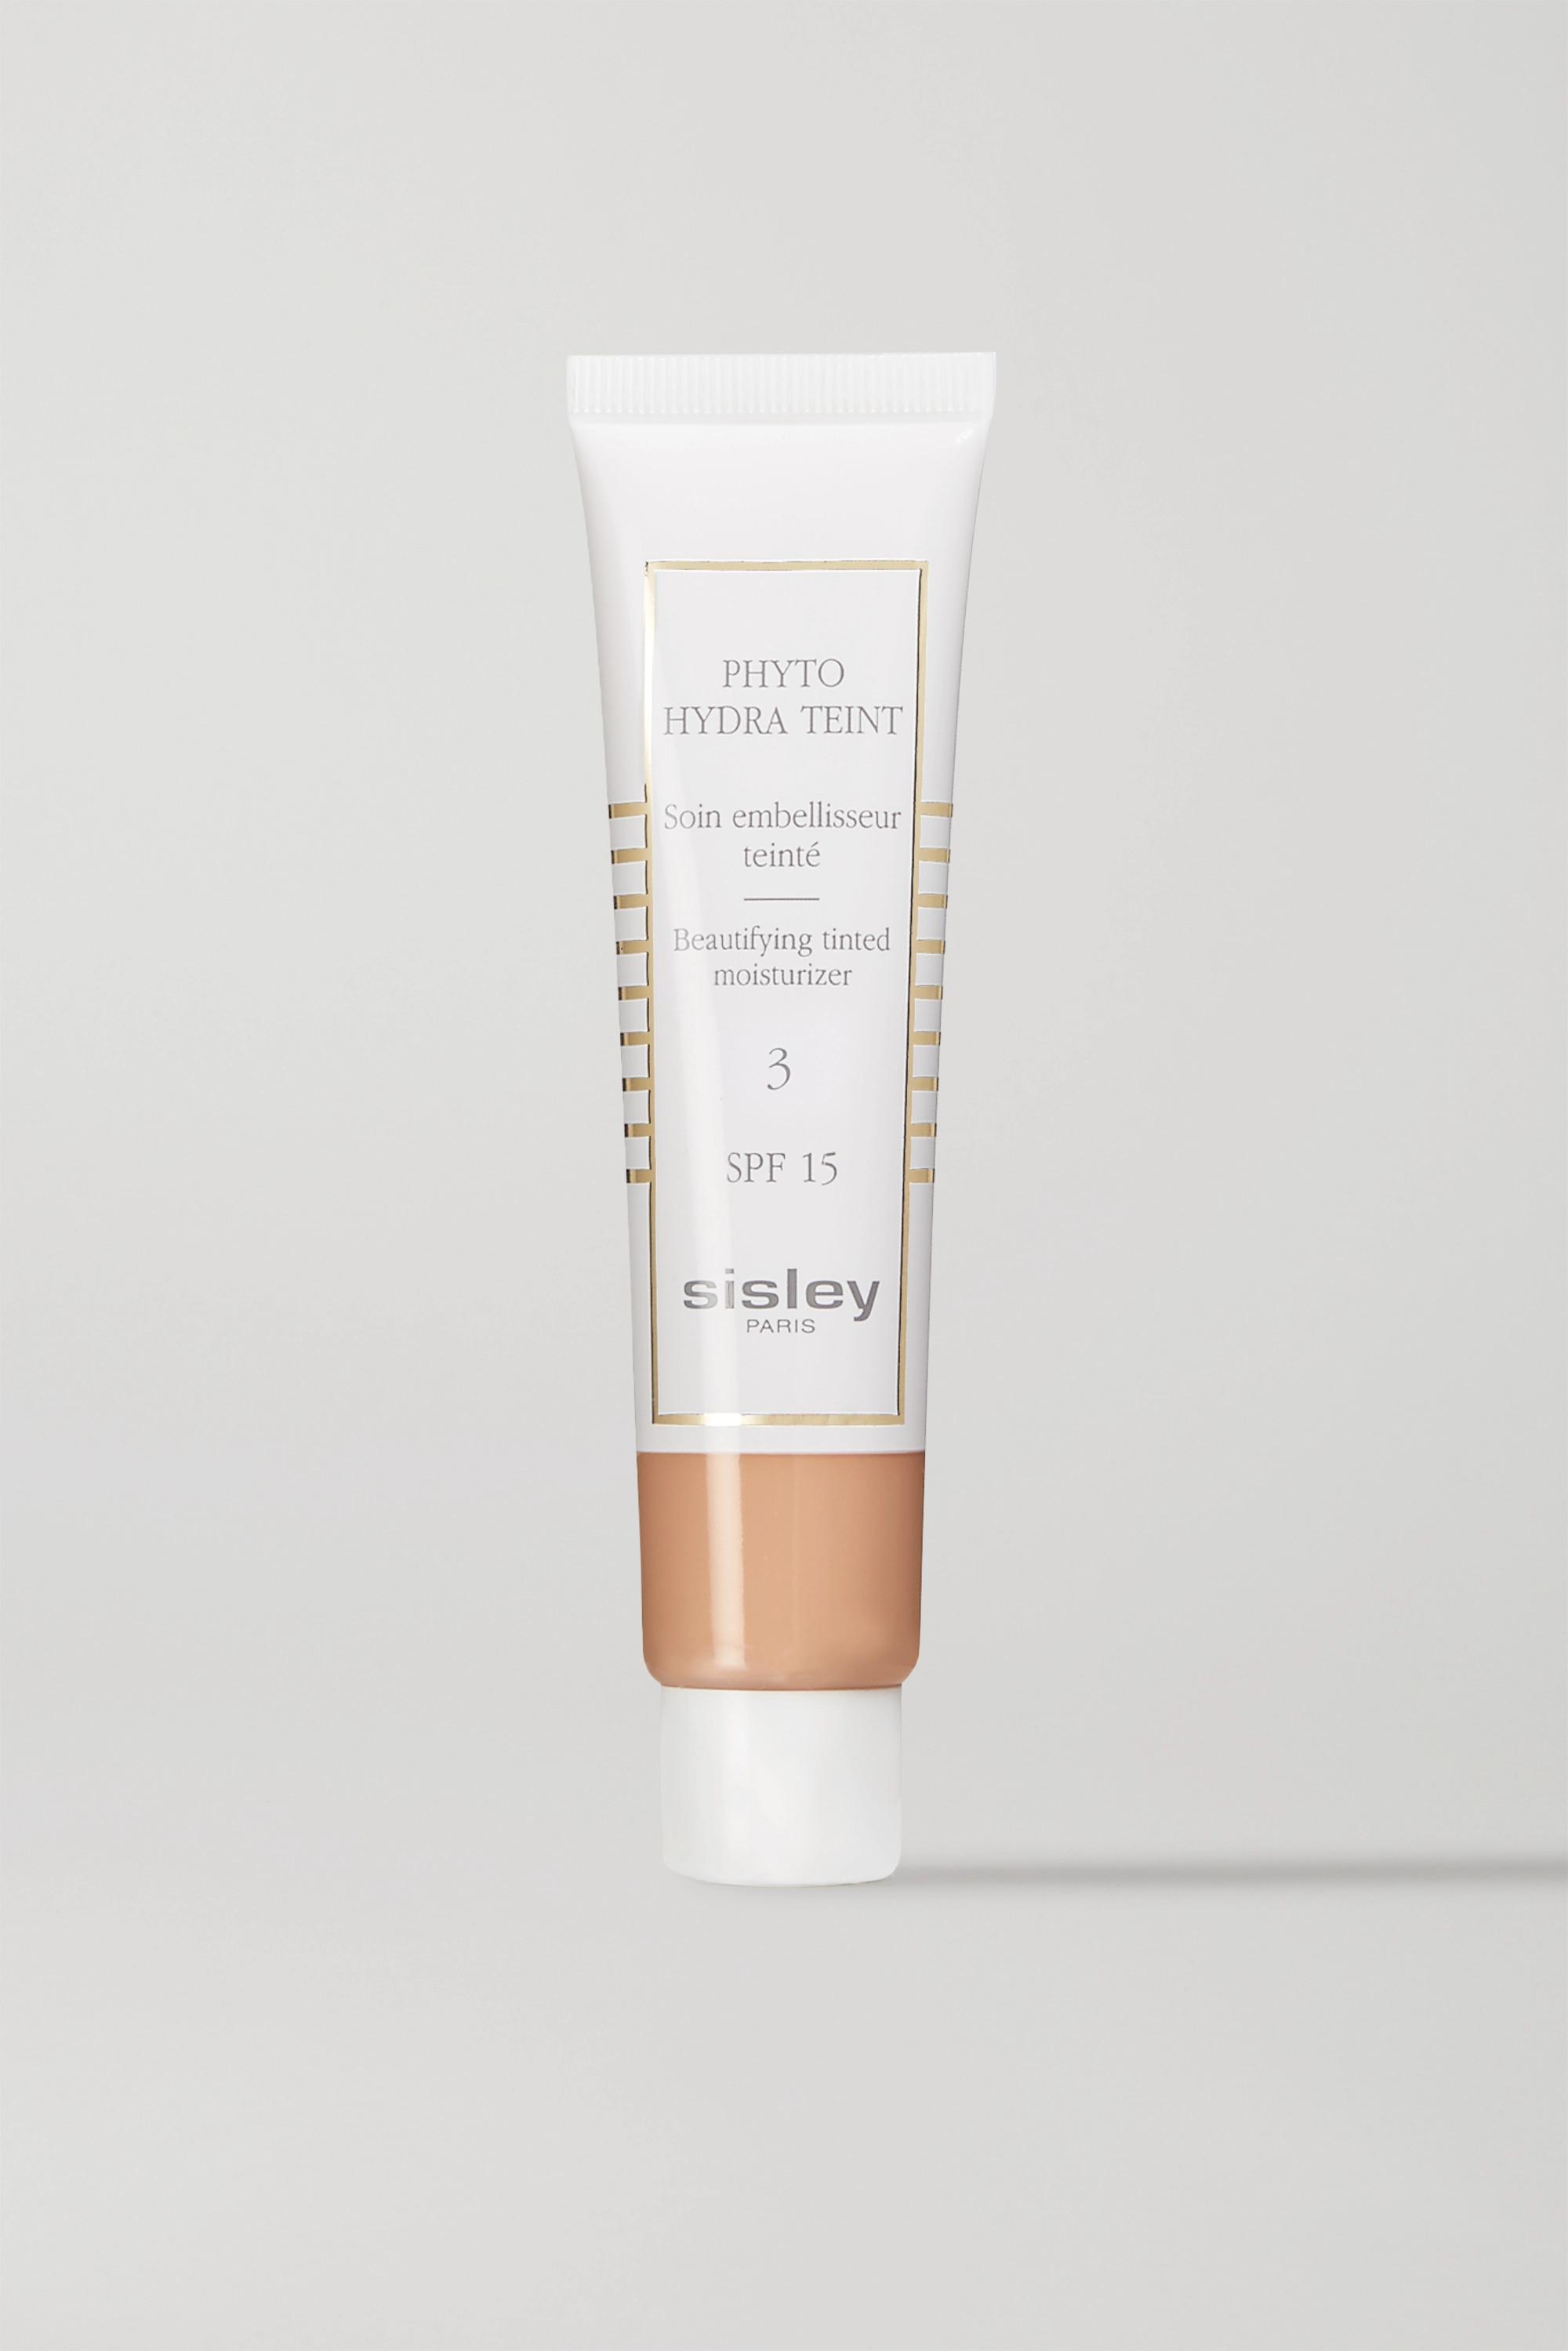 Sisley Phyto Hydra Teint Beautifying Tinted Moisturizer SPF15 - 3 Golden, 40ml